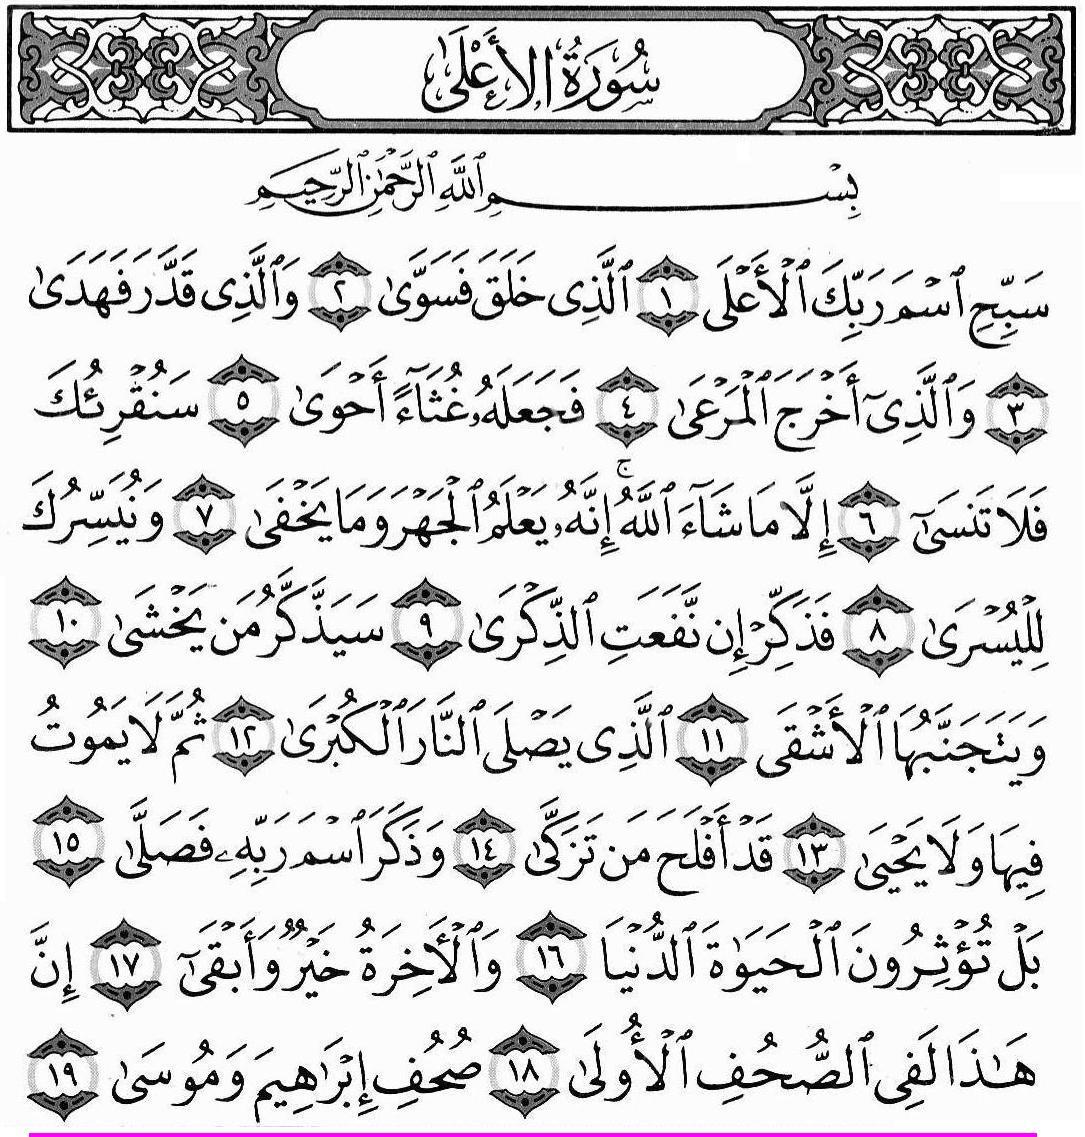 Surah al-A'laa